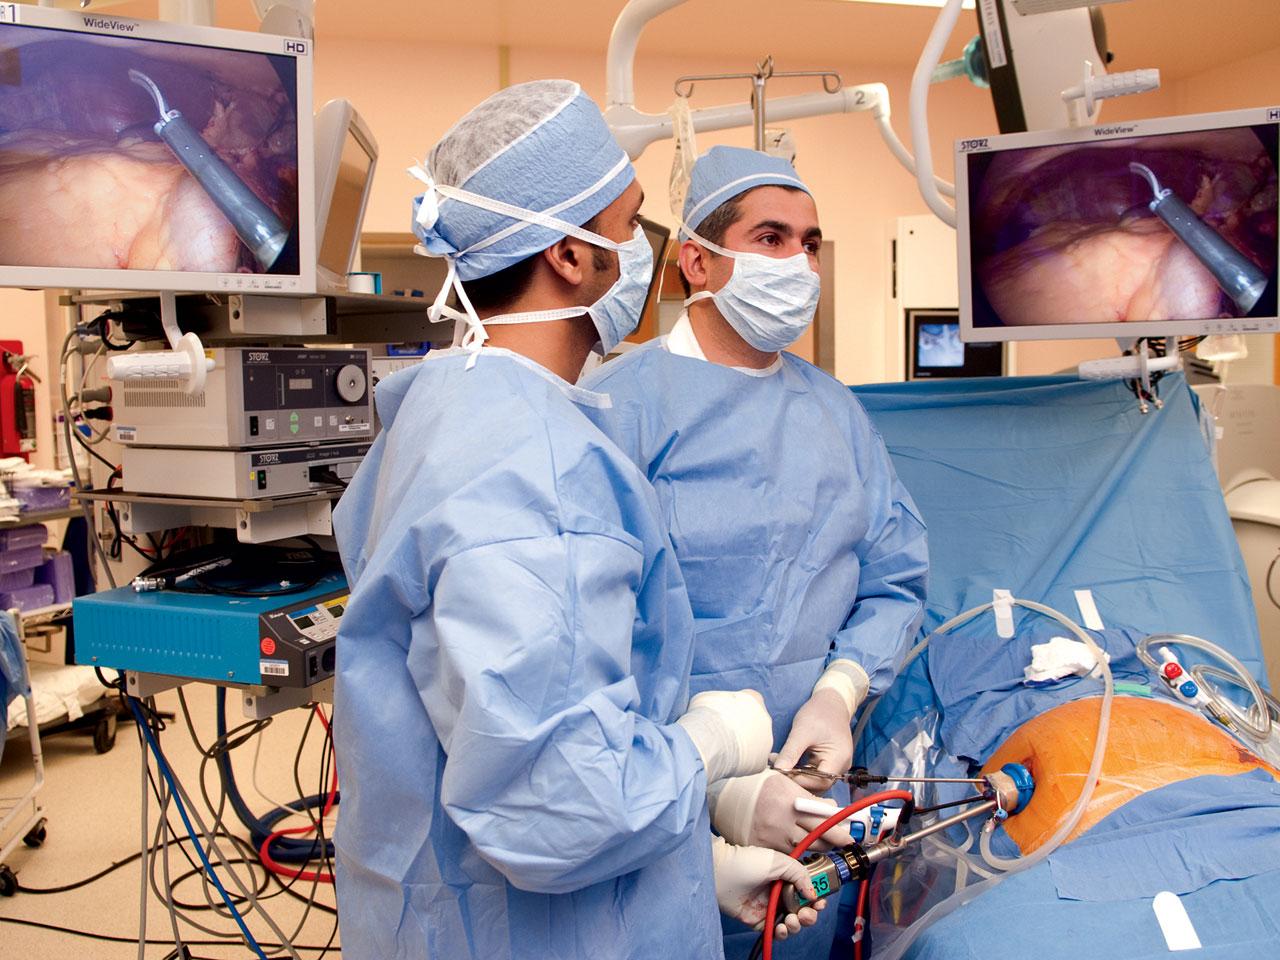 fda eyes increase in freak accidents during robotic surgeries fda eyes increase in freak accidents during robotic surgeries cbs news